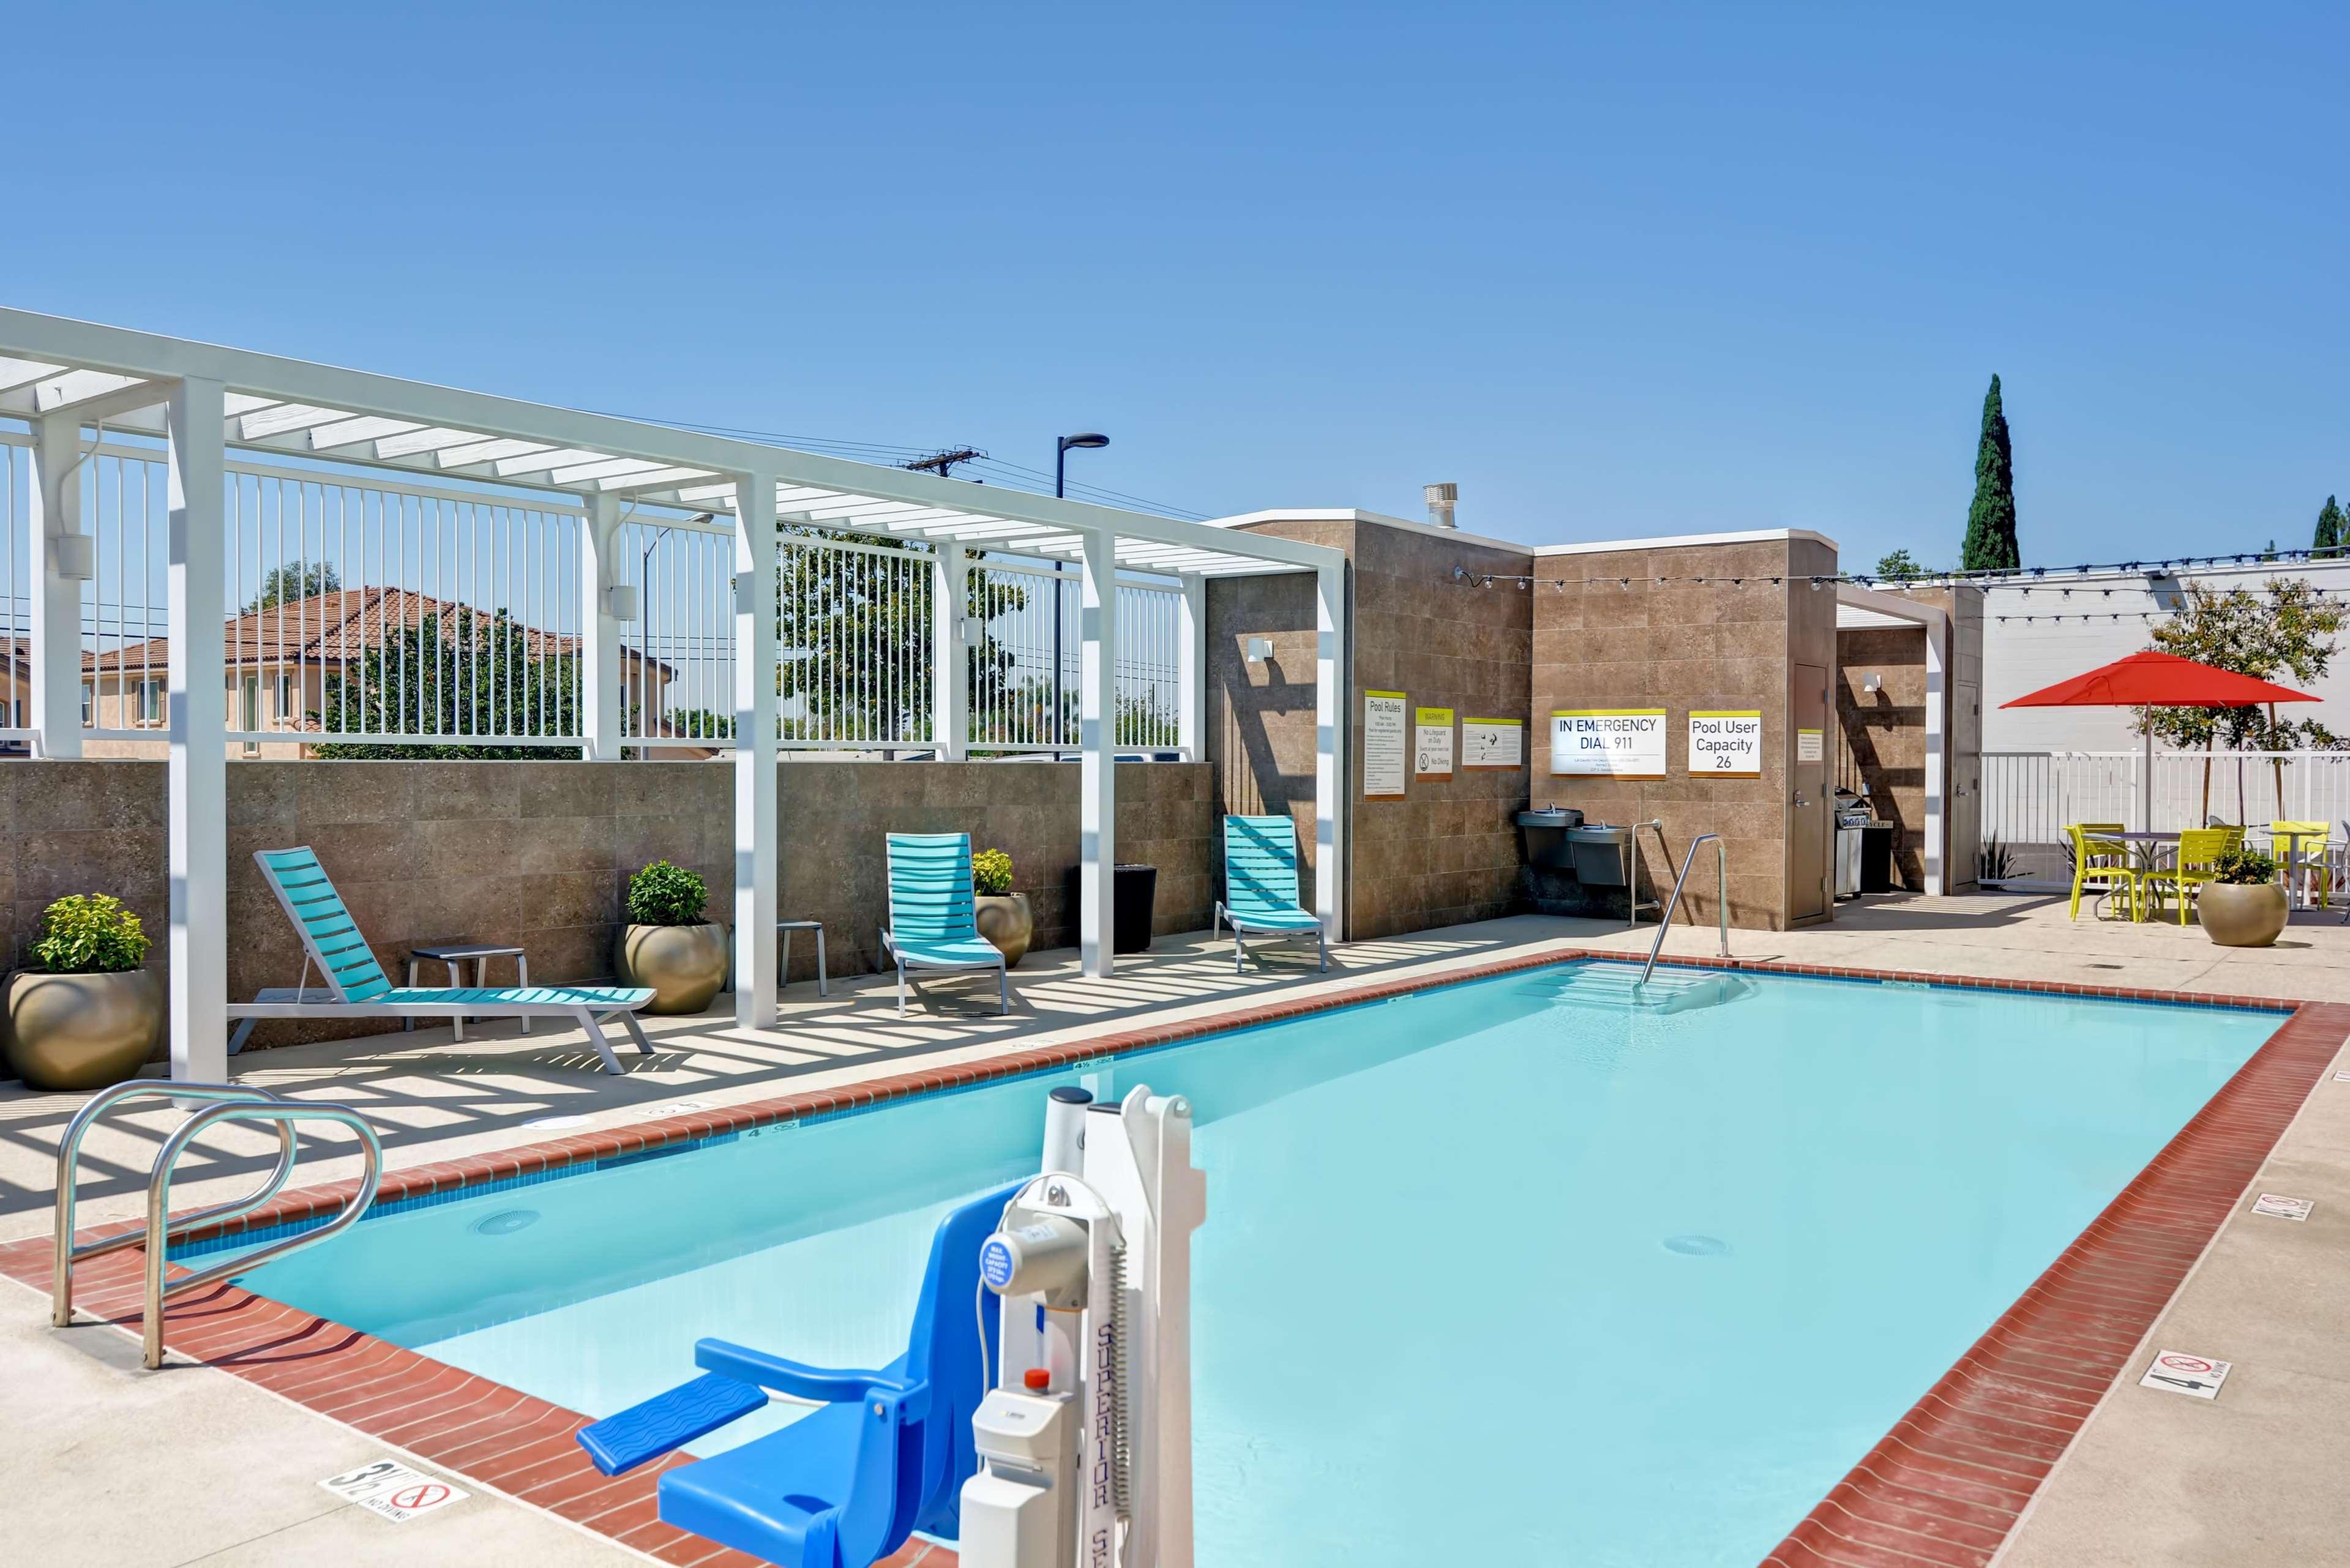 Home2 Suites by Hilton Azusa image 32